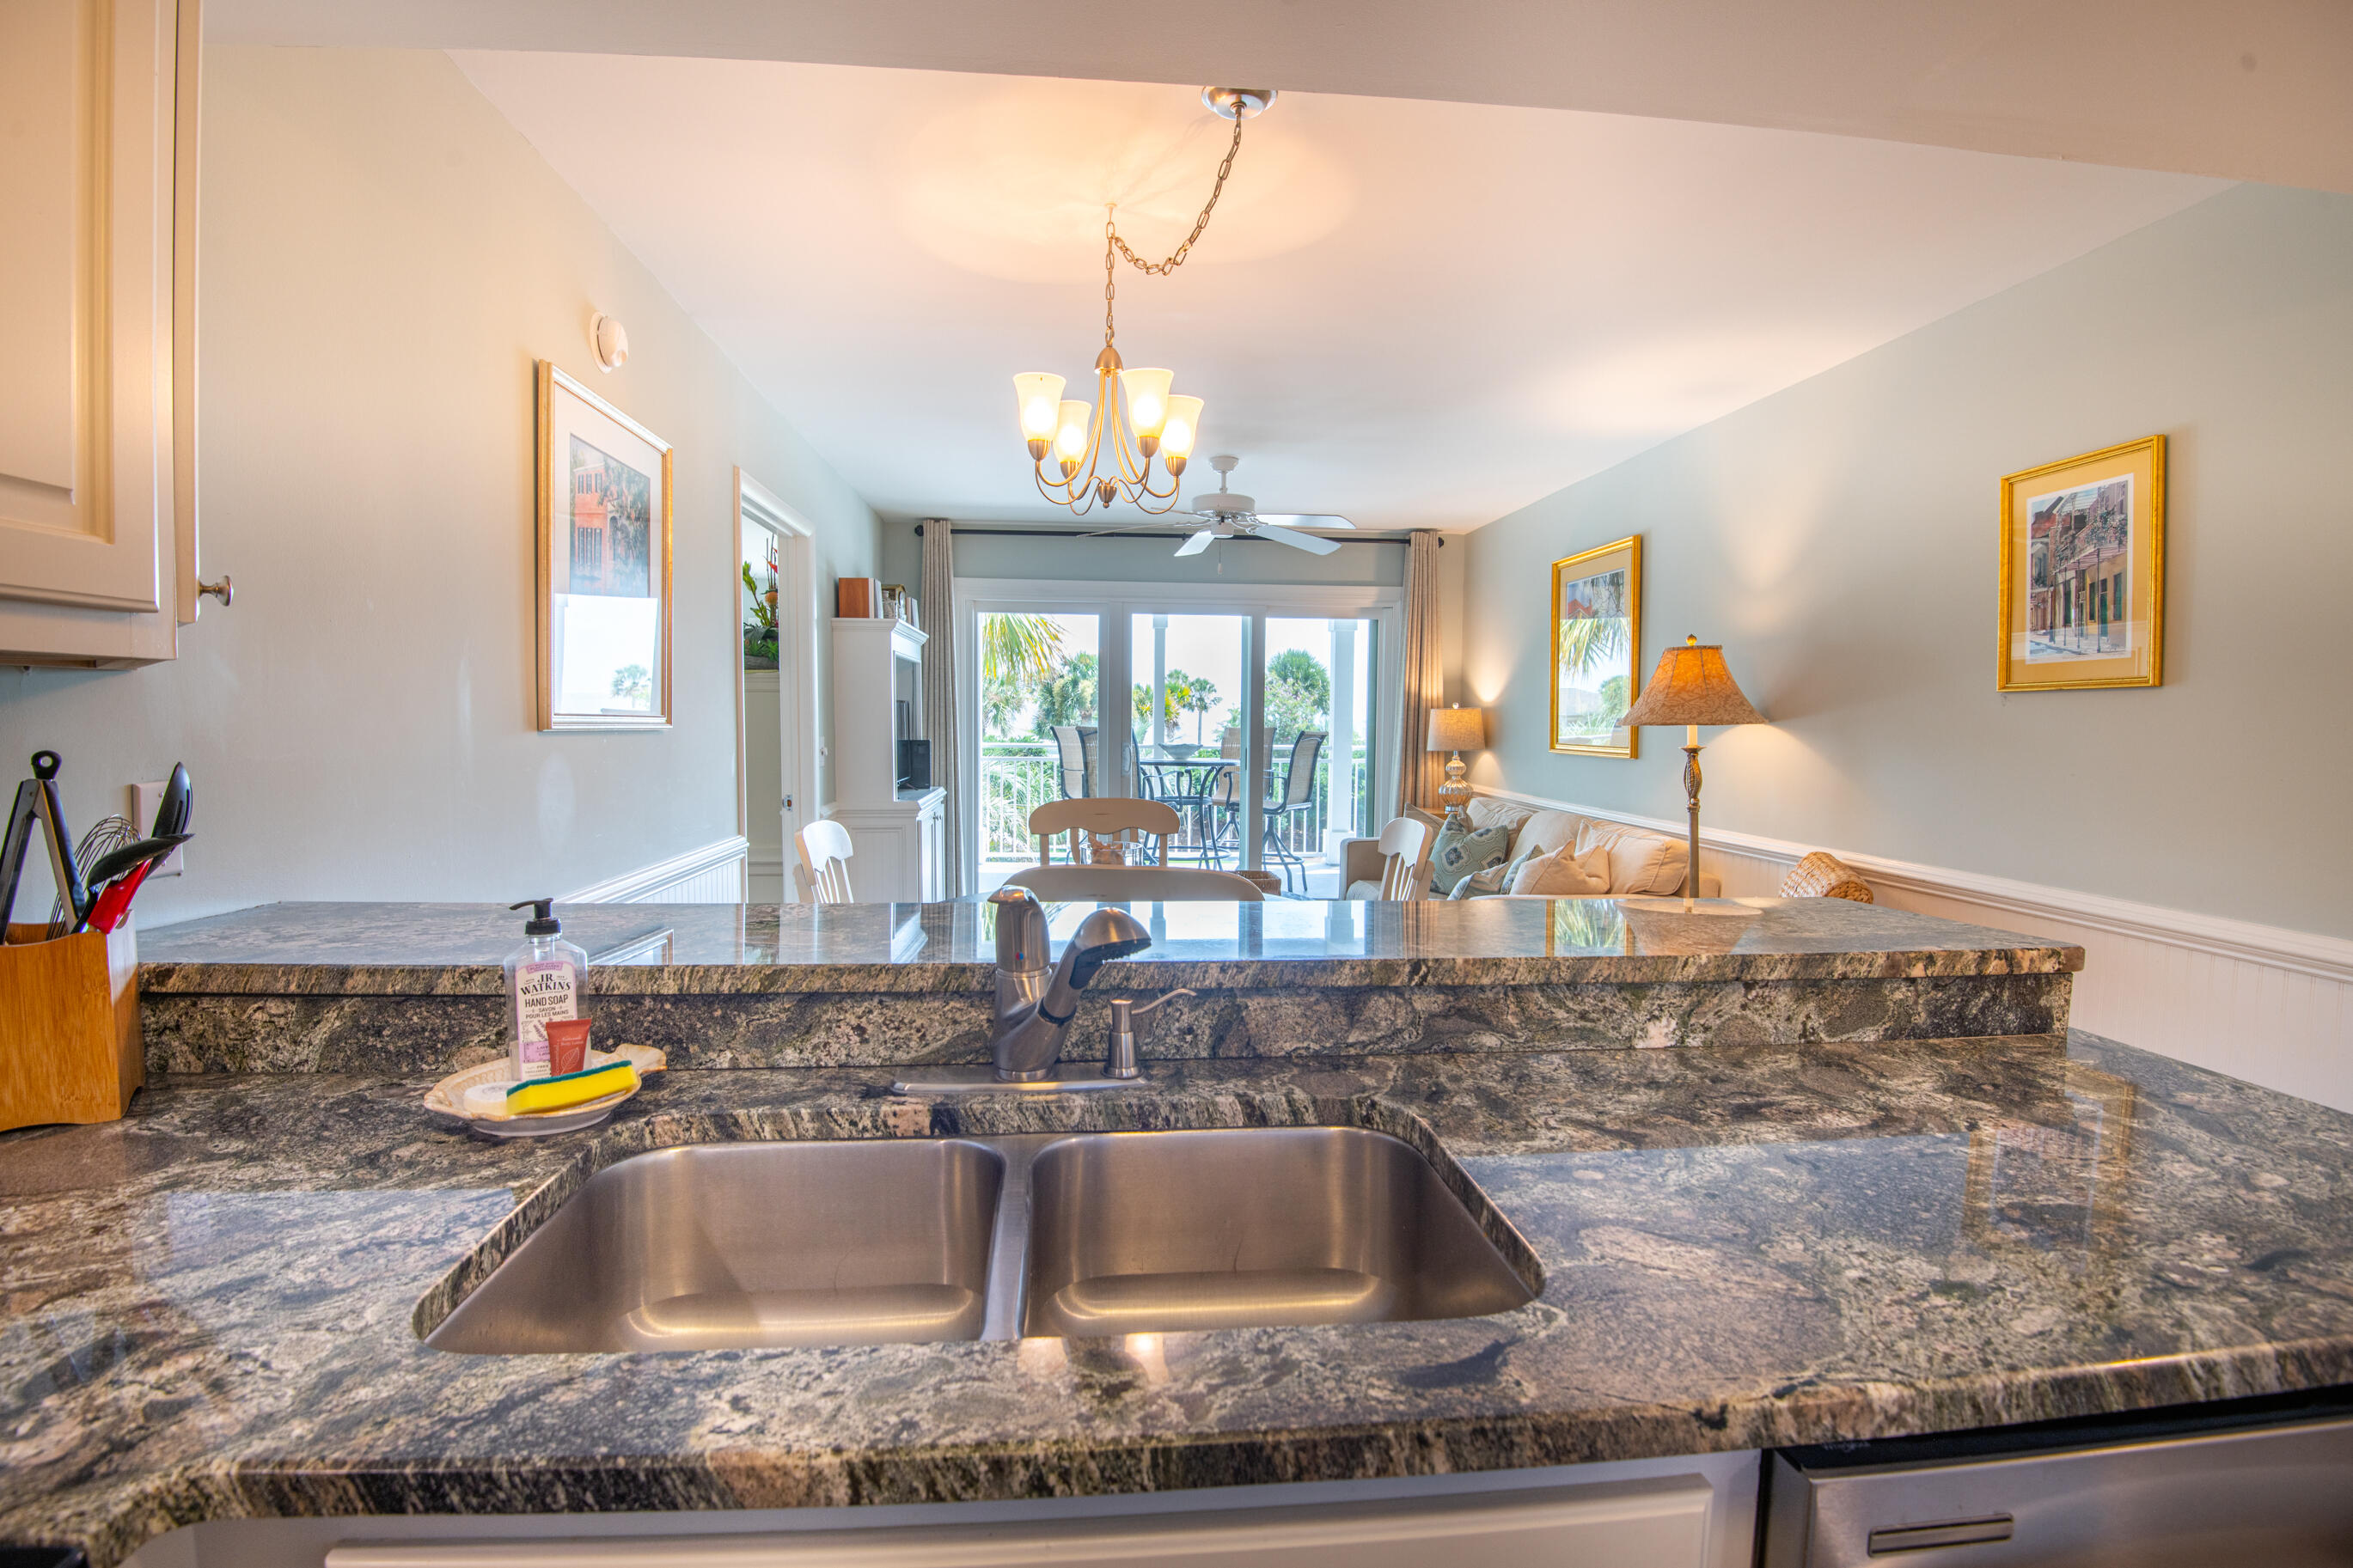 Atrium Villas Homes For Sale - 2935 Atrium Villa, Seabrook Island, SC - 54